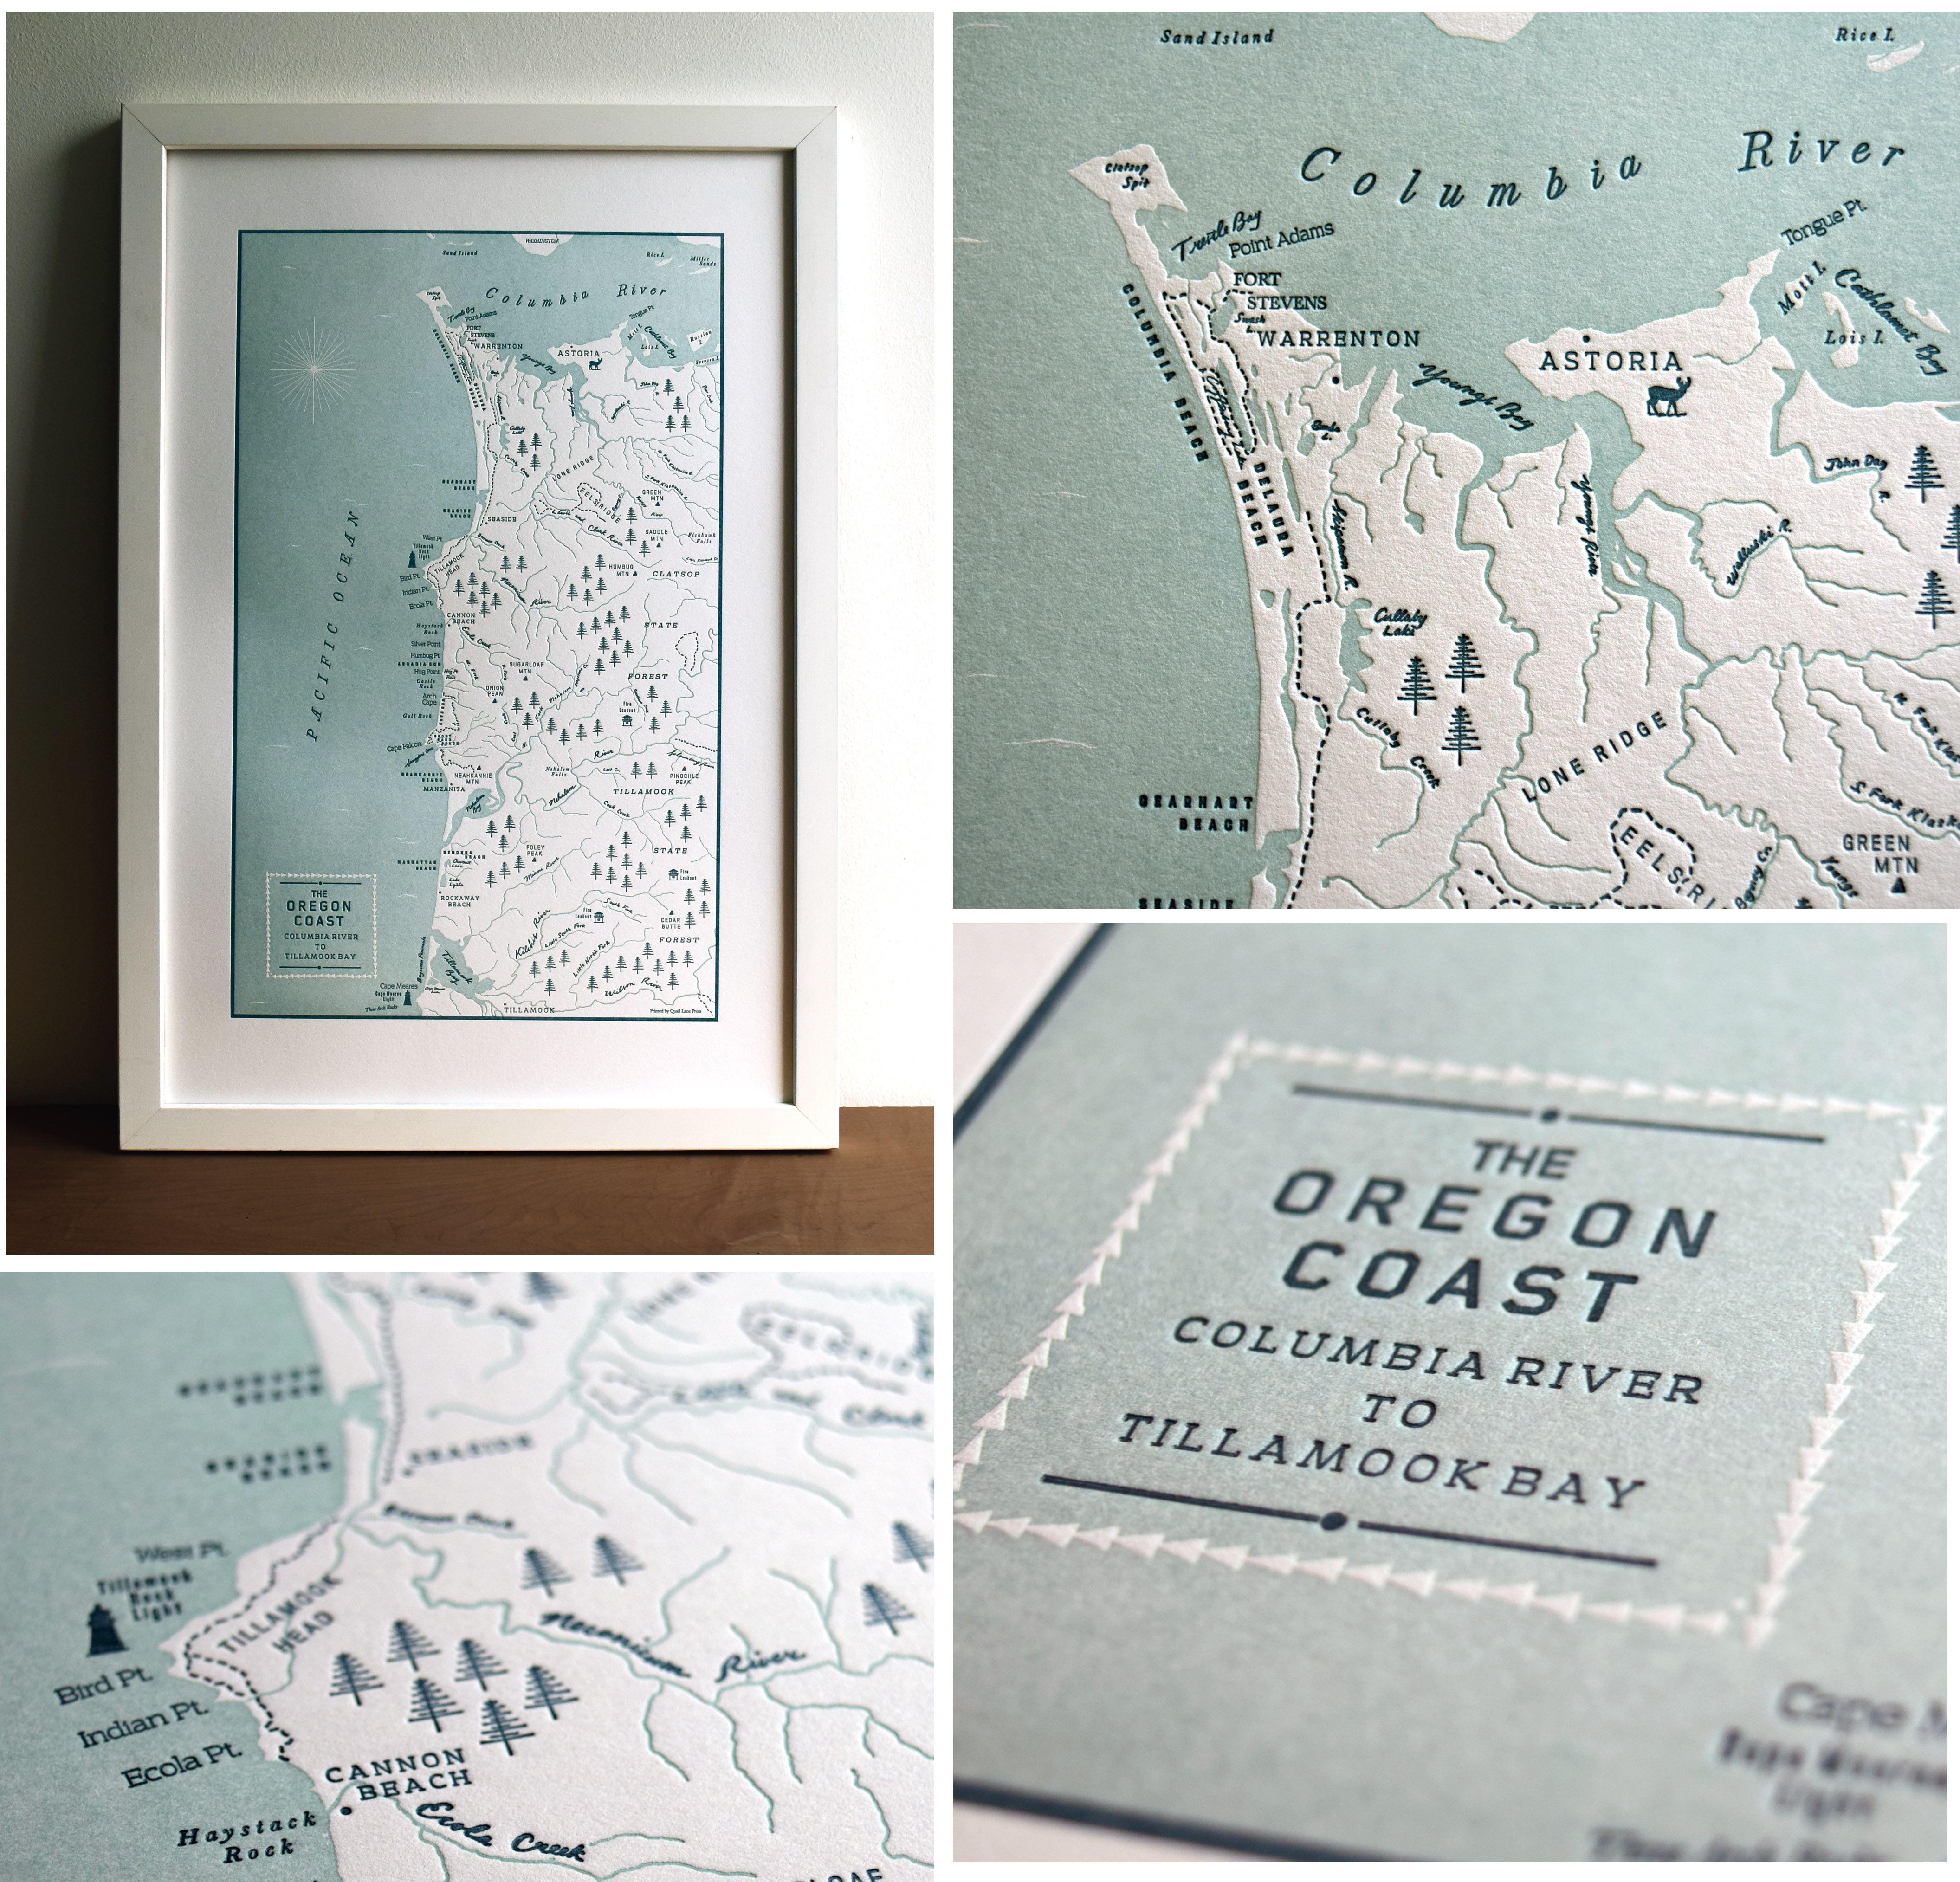 Oregon Coast Map Columbia River to Tillamook Bay Map Print in 2019